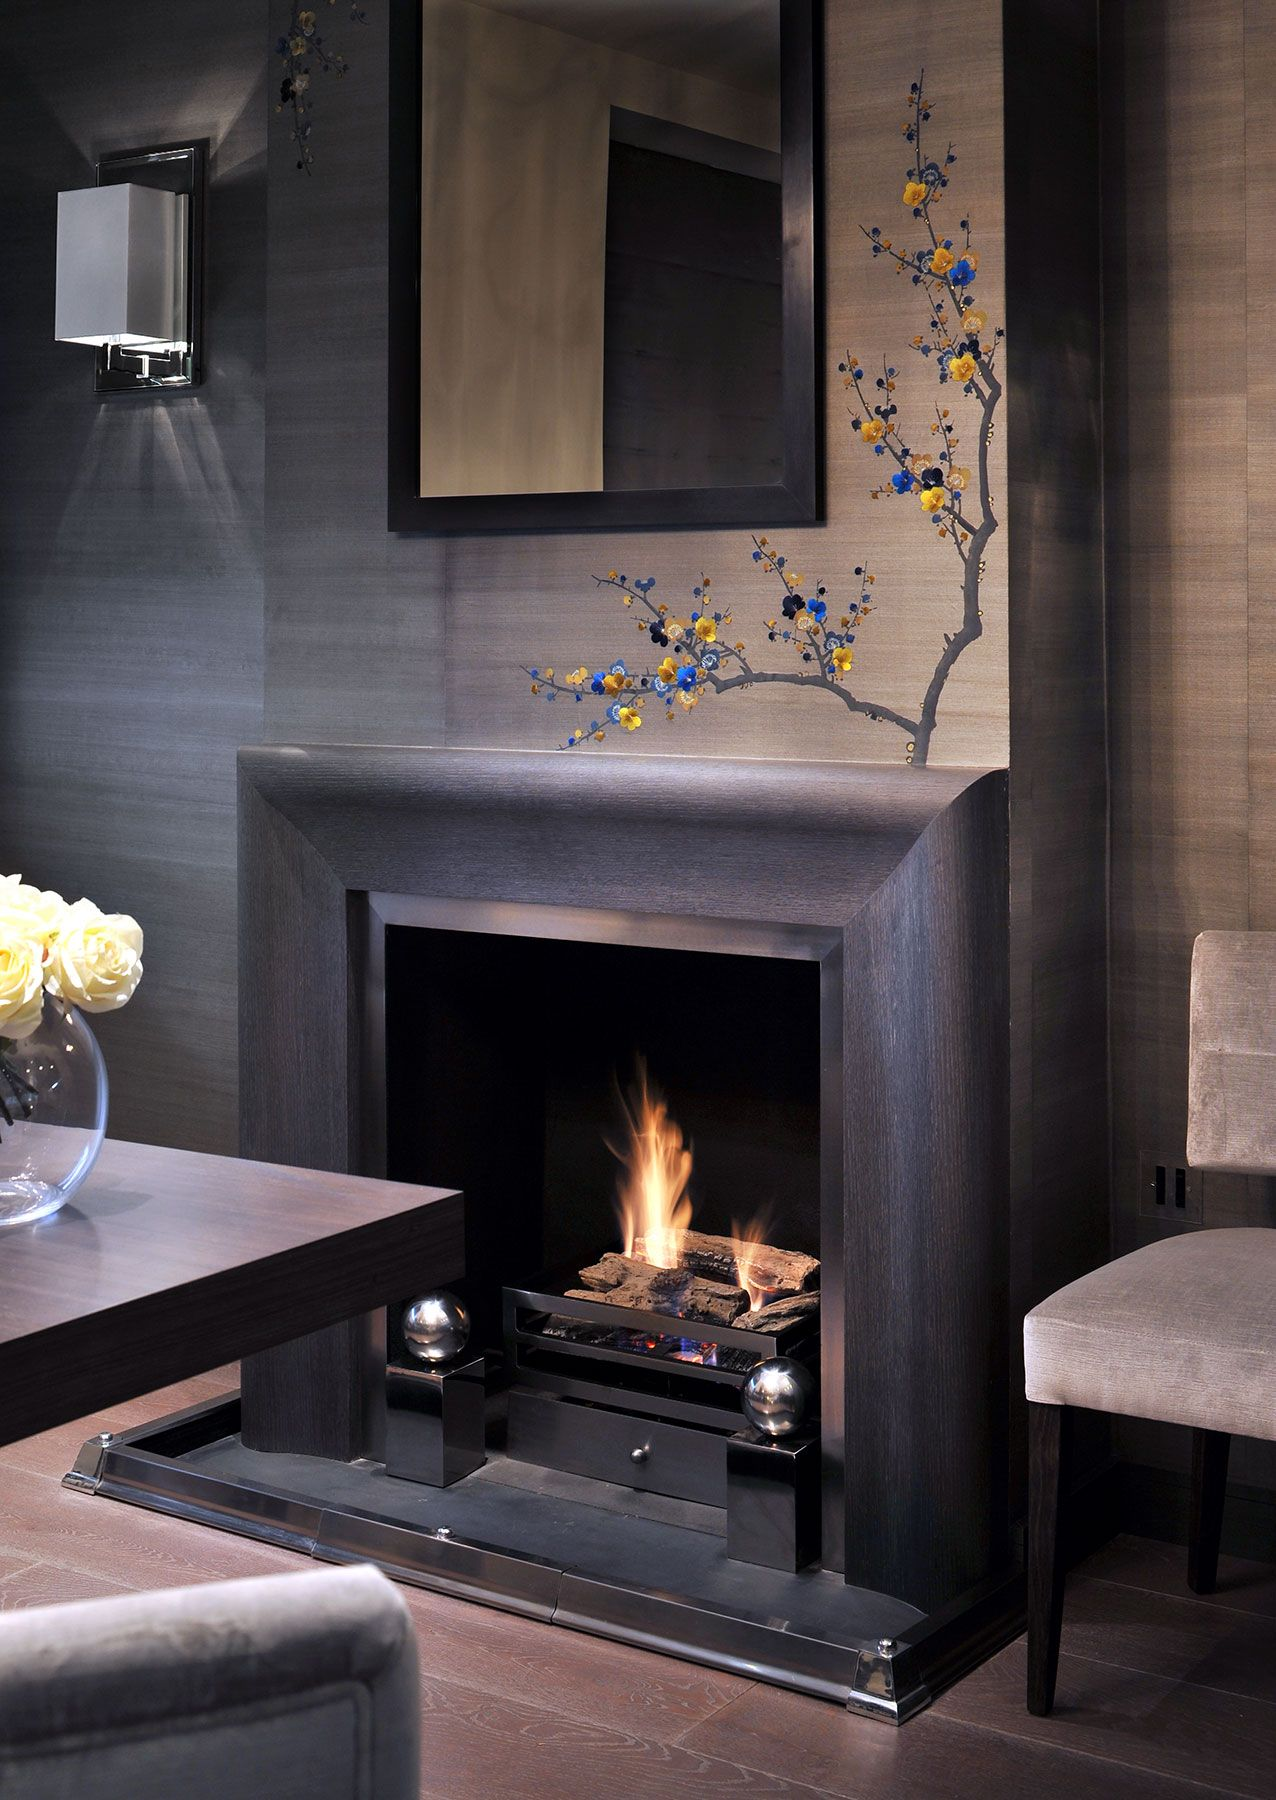 Zephyr interiors interior design projects in london interiors